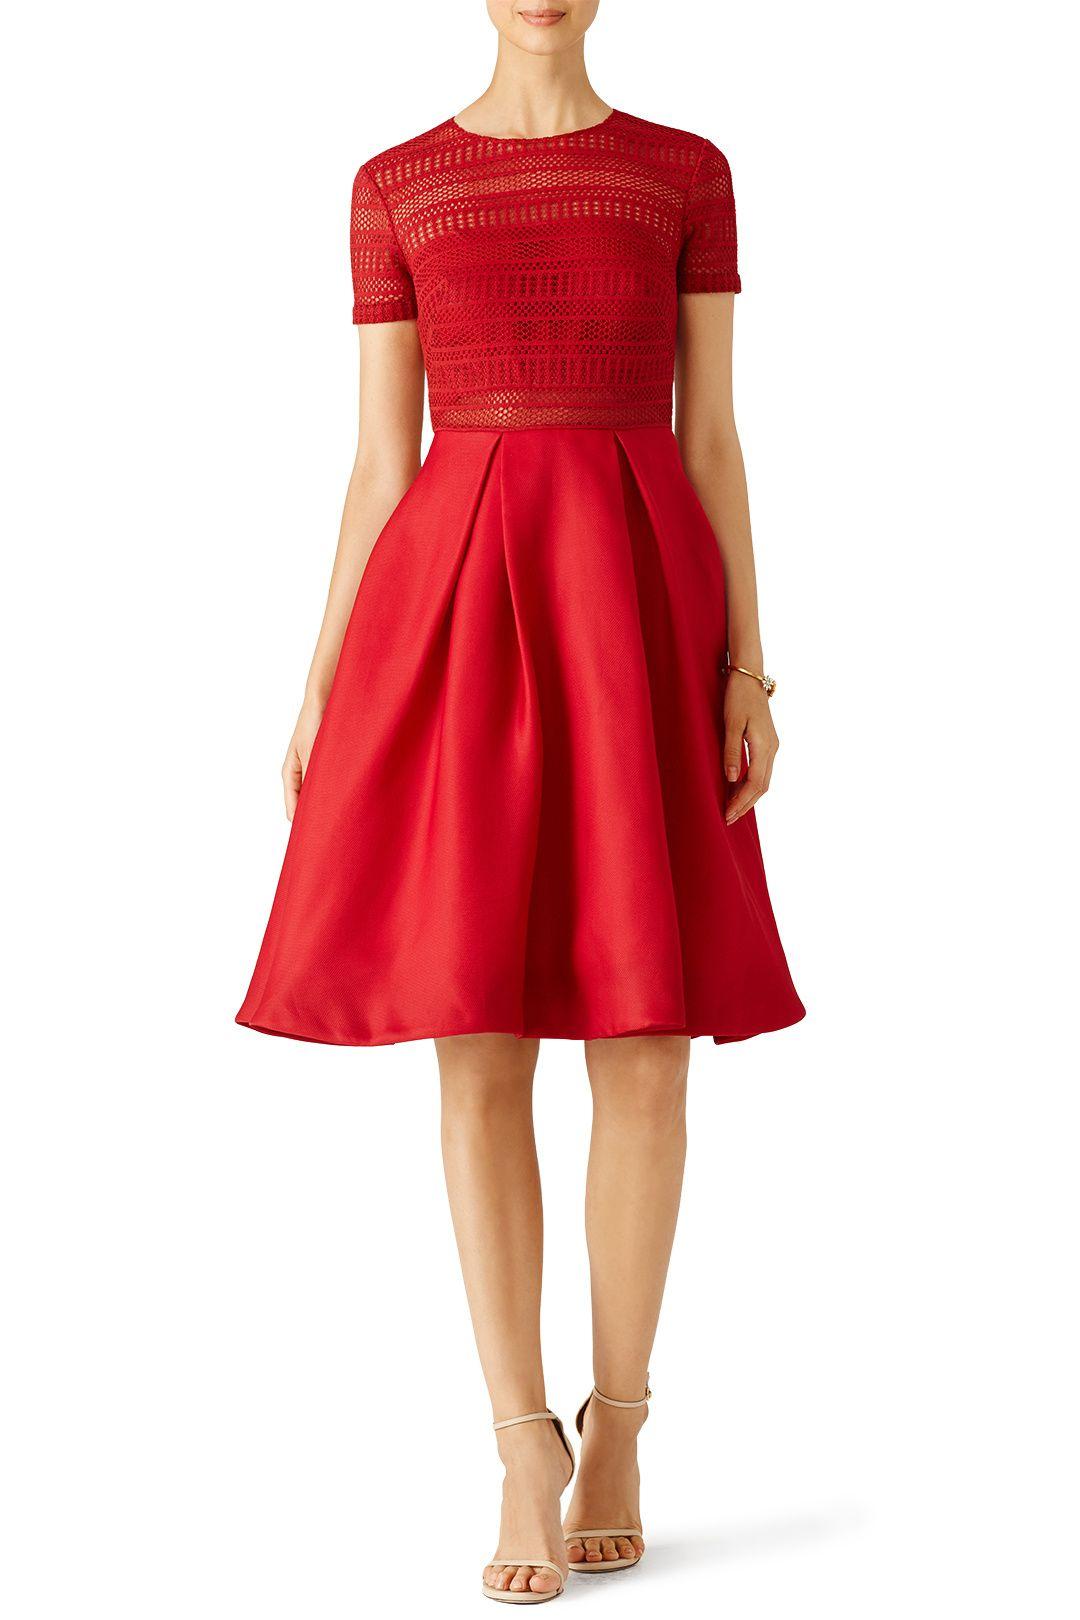 Red Contrast Top Ballerina Dress | Celebrity Style | Pinterest ...